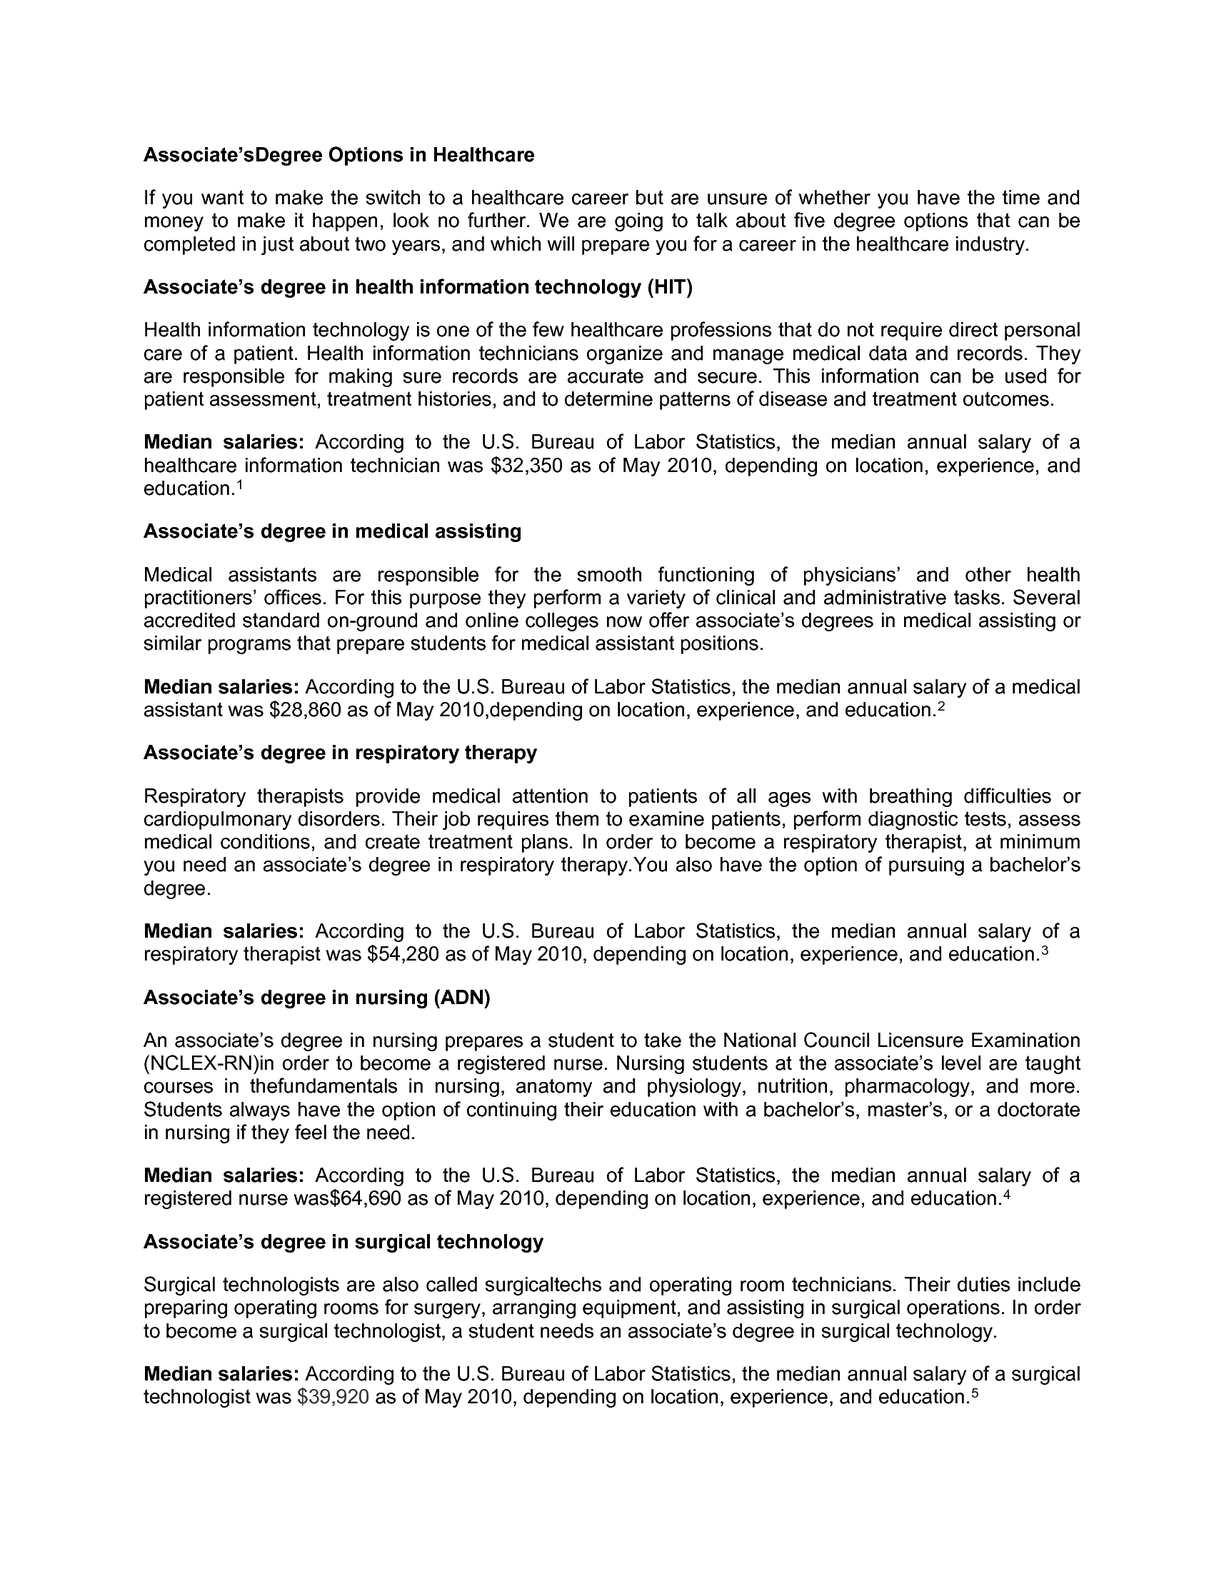 Calaméo - Associates Degree Options in Healthcare v3